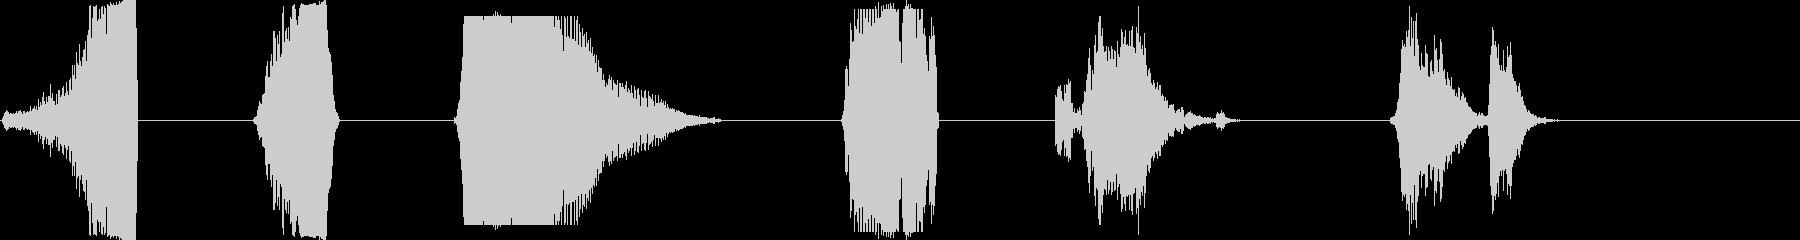 DJパワーサージX6の未再生の波形